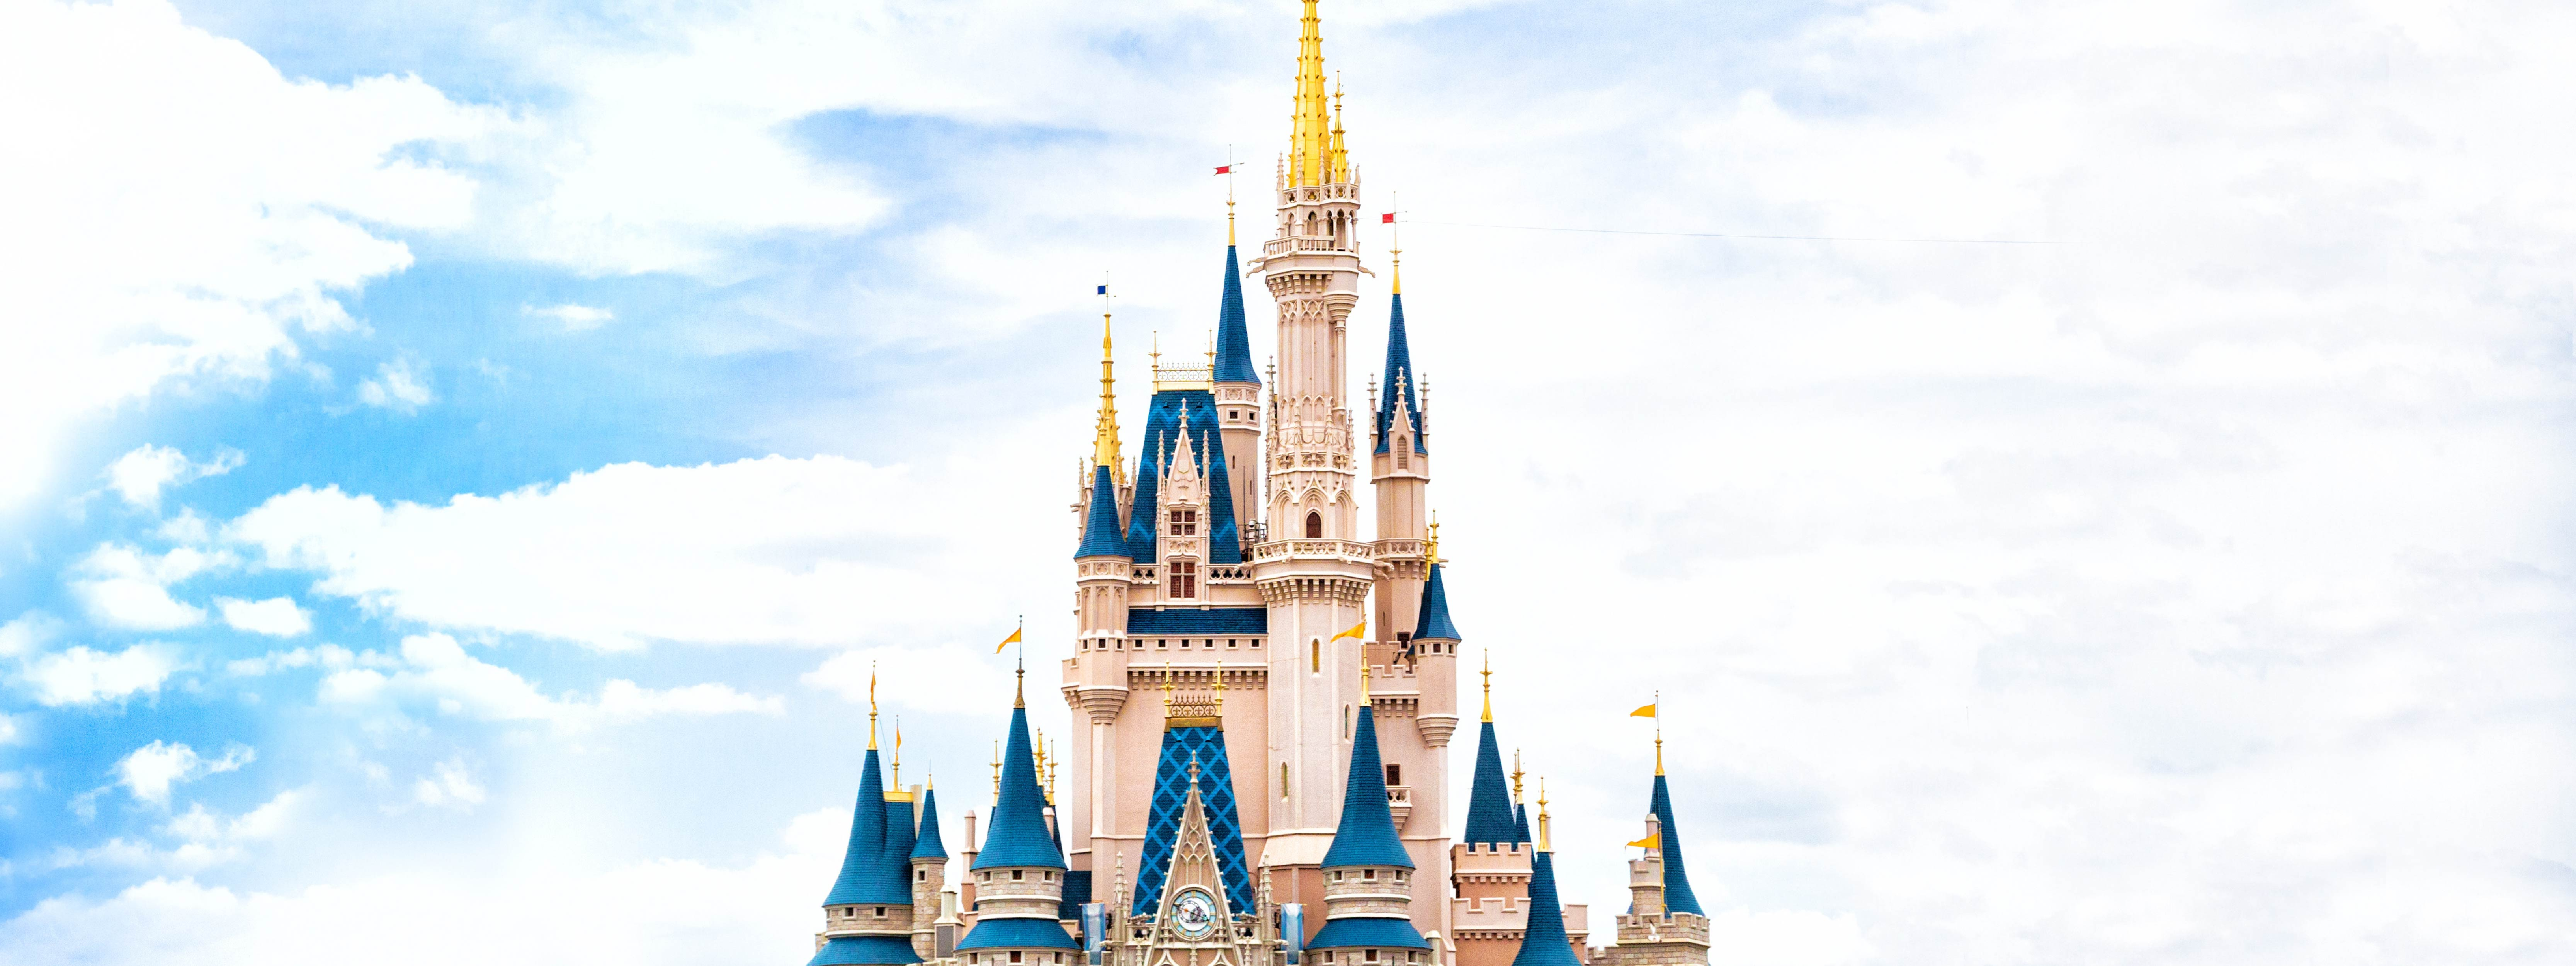 Best Places to Live Around Disney World